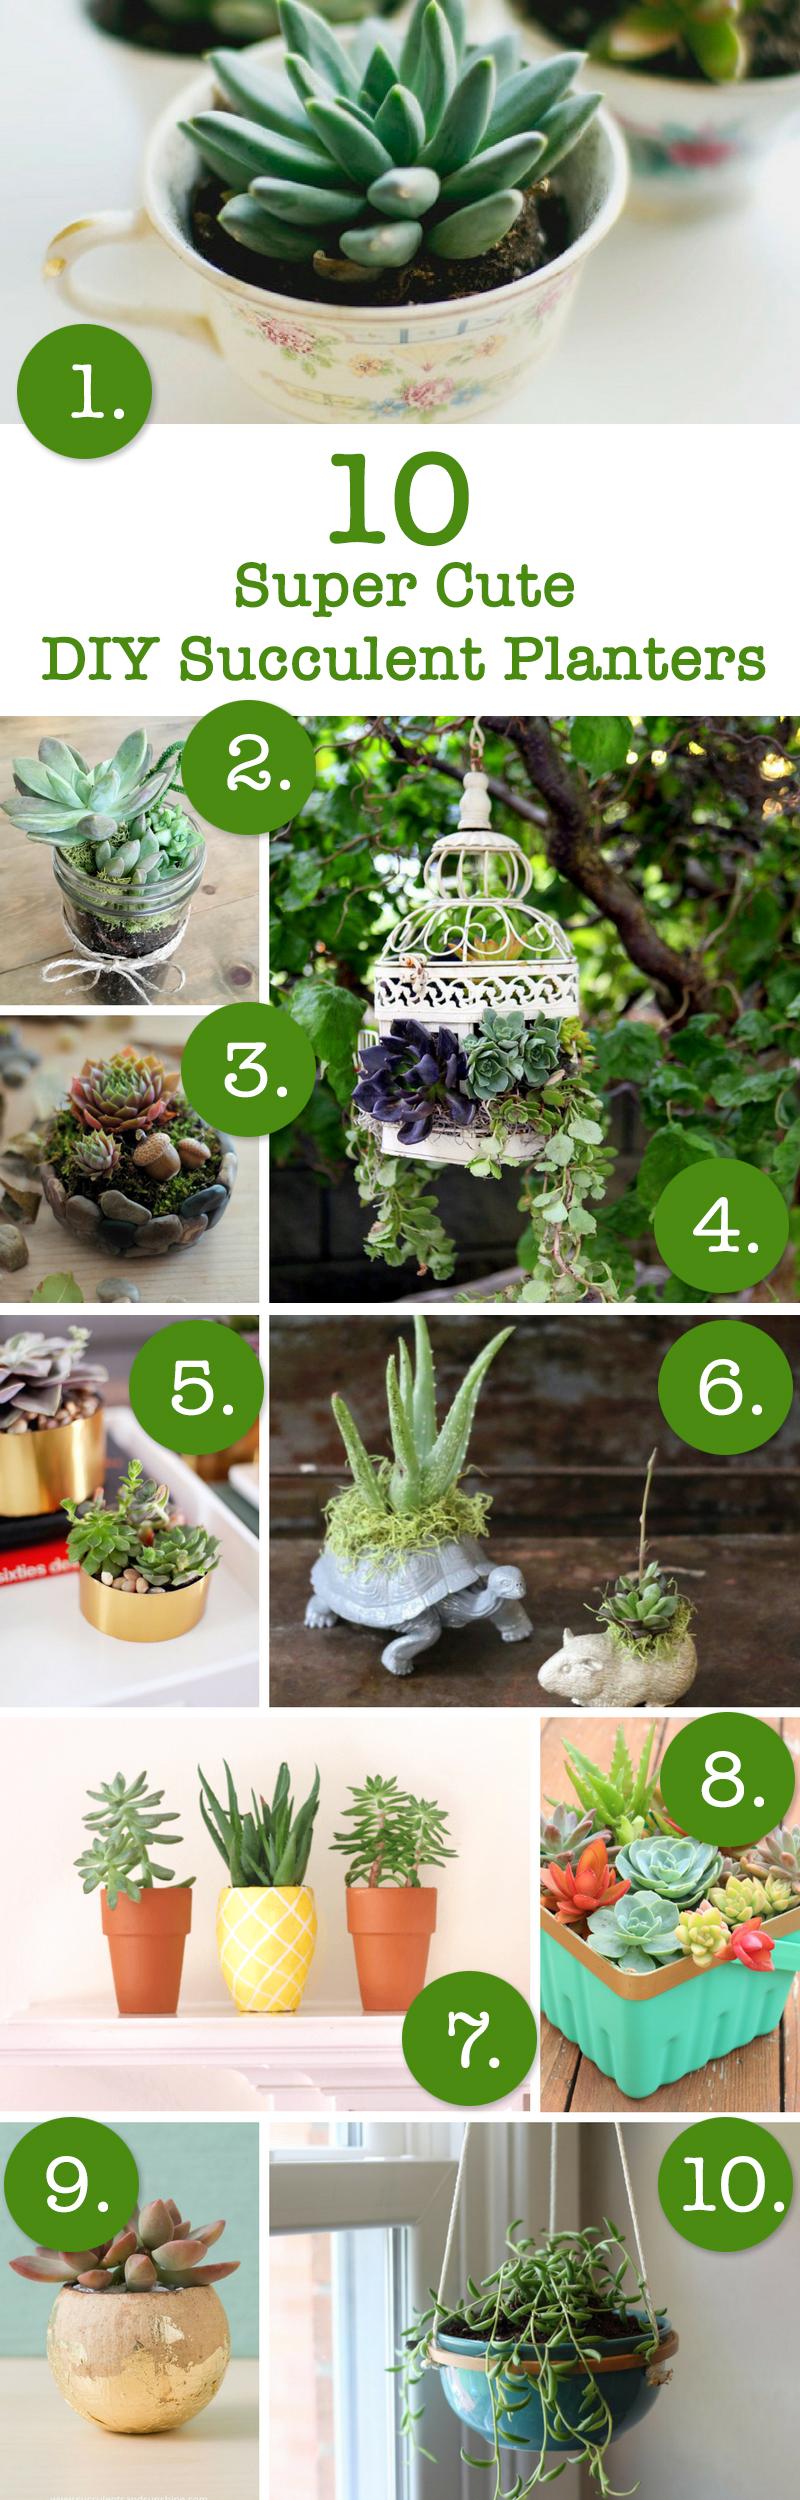 10-cute-DIY-succulent-planters.jpg